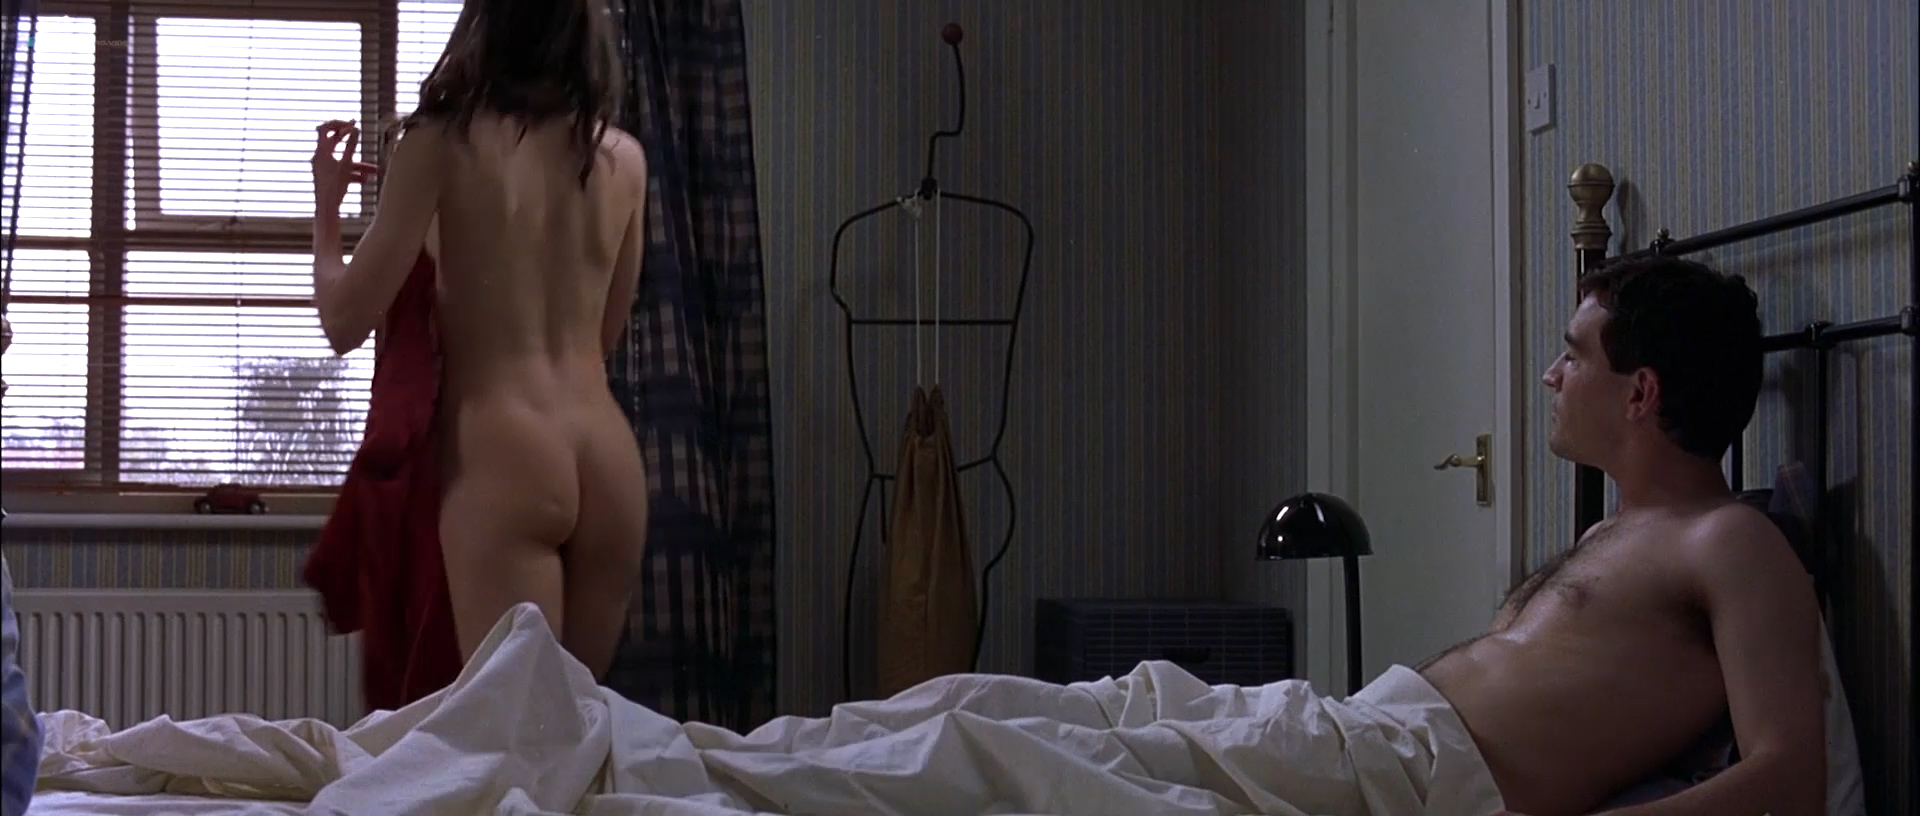 Nicole Kidman Nude Sex And Butt Naked - Birthday Girl 2001 Hd 1080P-7153